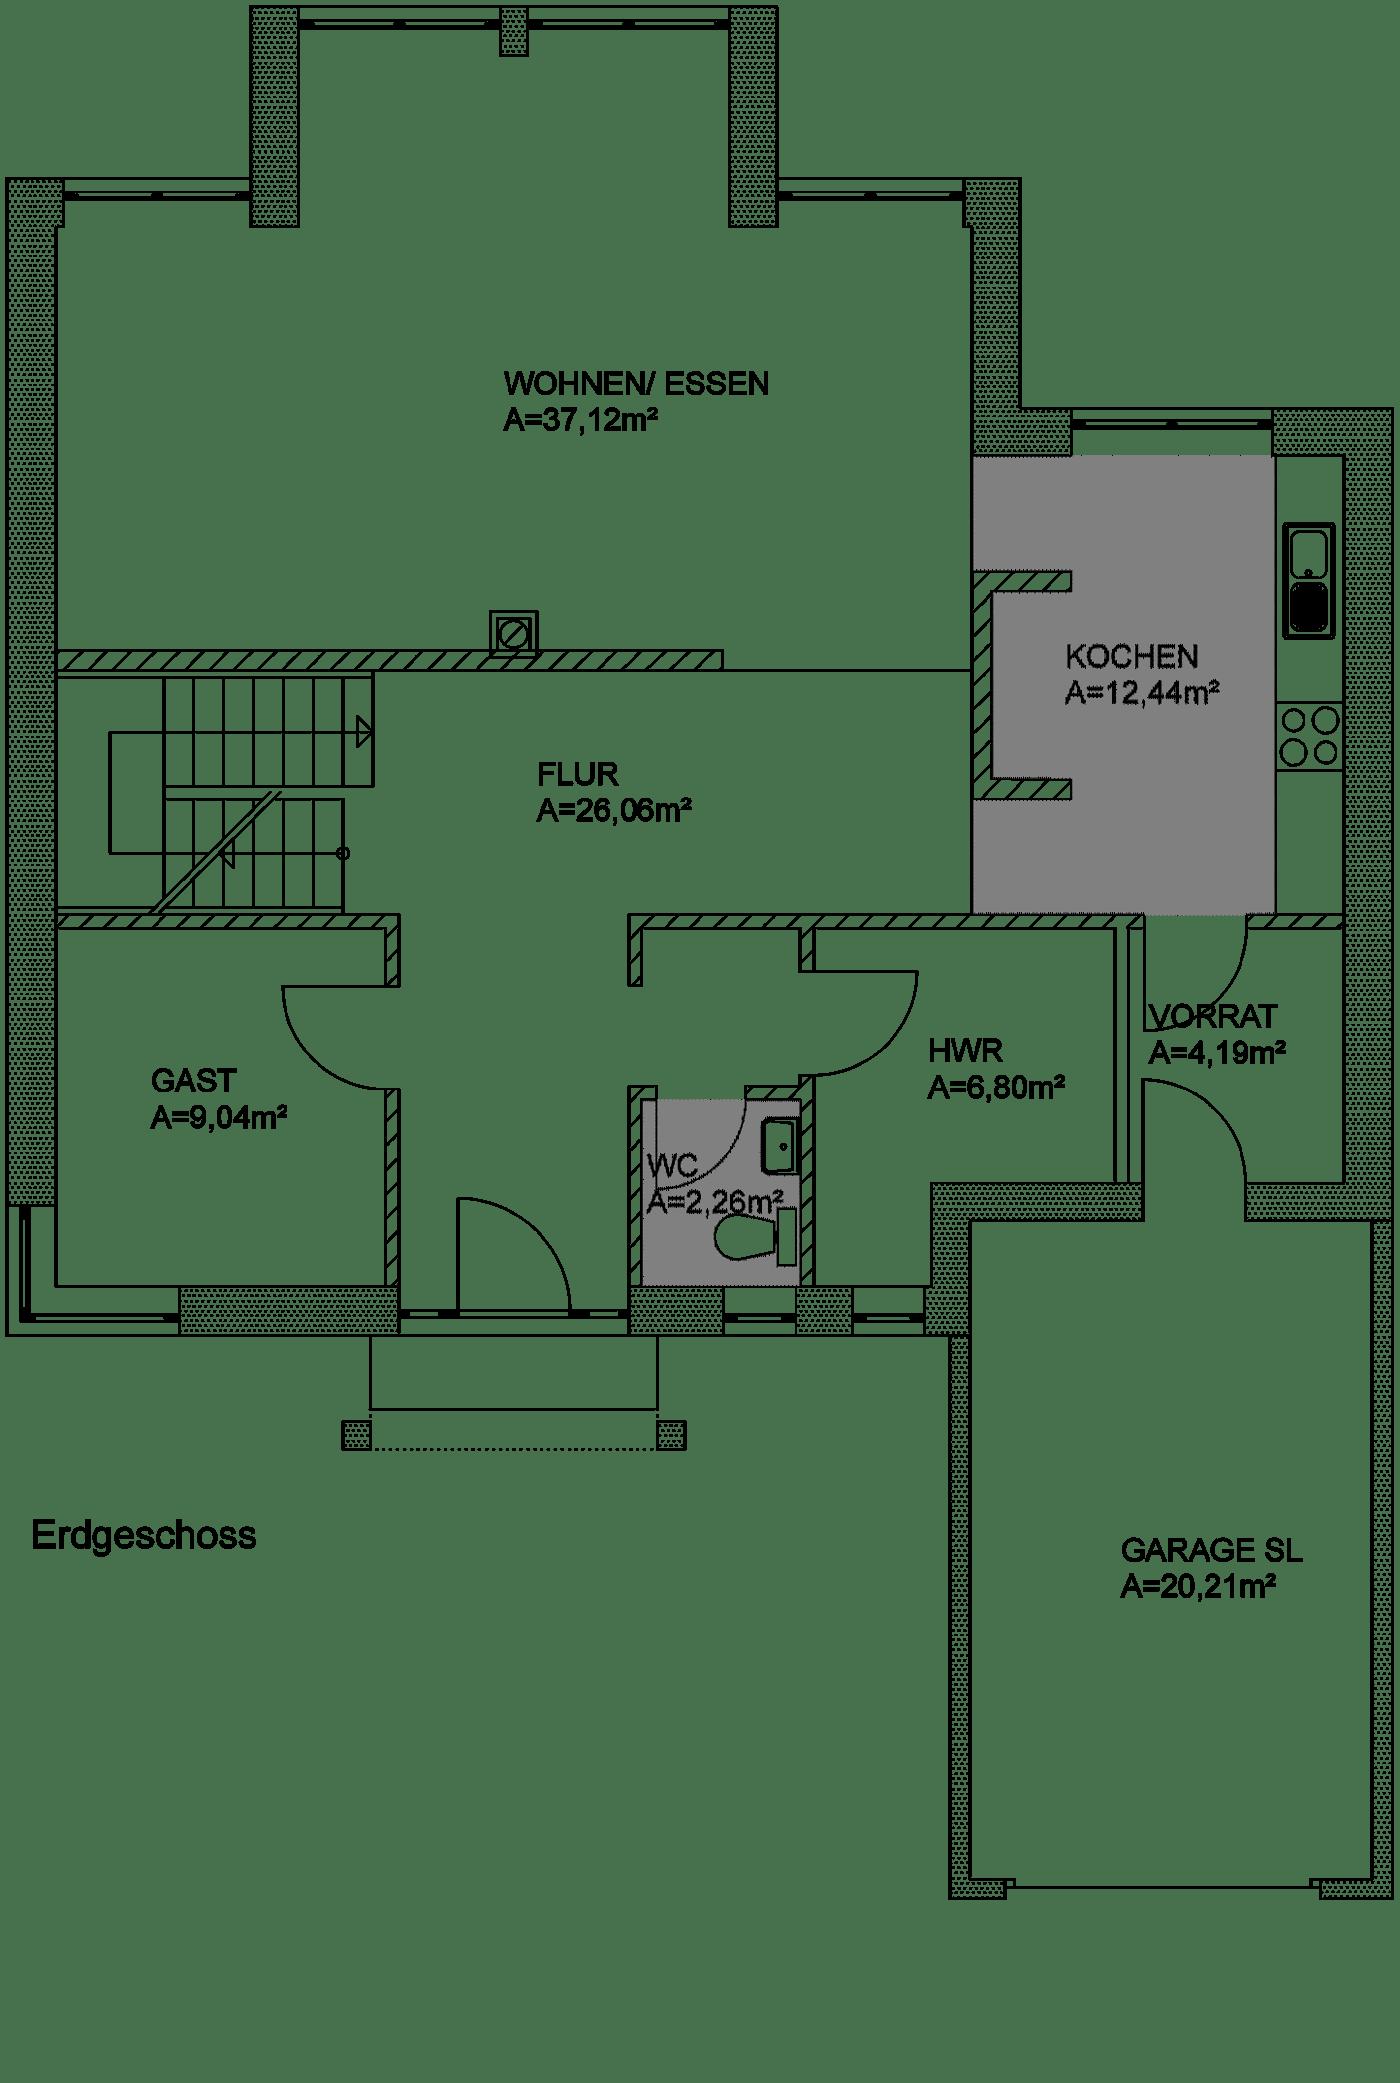 energie-effizienzhaus-plus-grundriss-eg